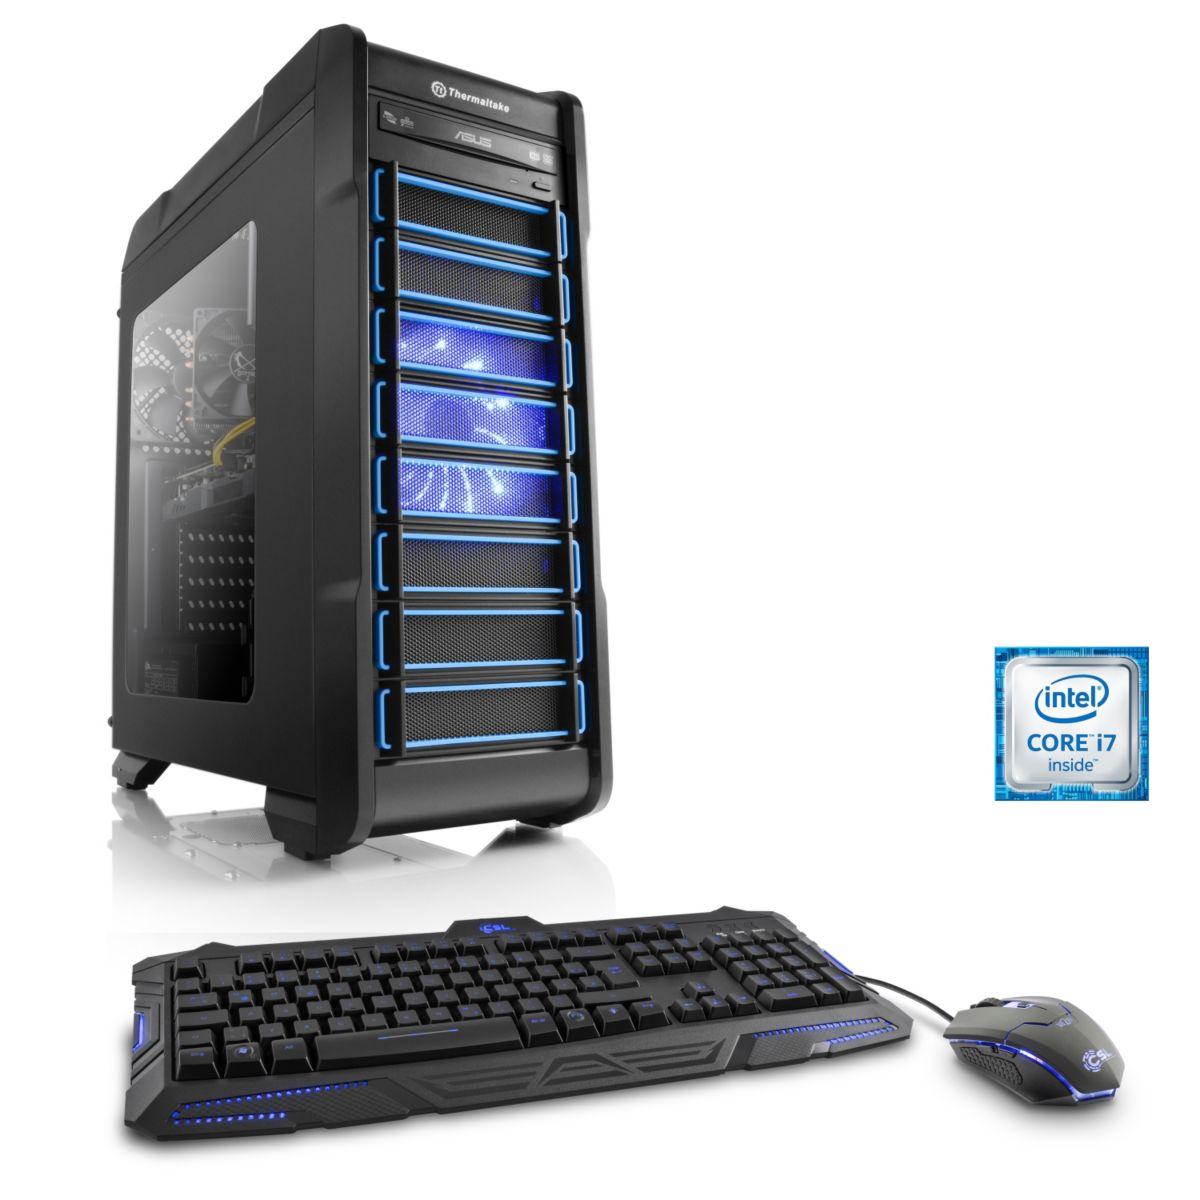 separation shoes 2bf86 32629 CSL Gaming PC i7-6700K   GeForce GTX 1060   16 GB DDR4   240 GB SSD  »Levitas T7820 Windows 10«